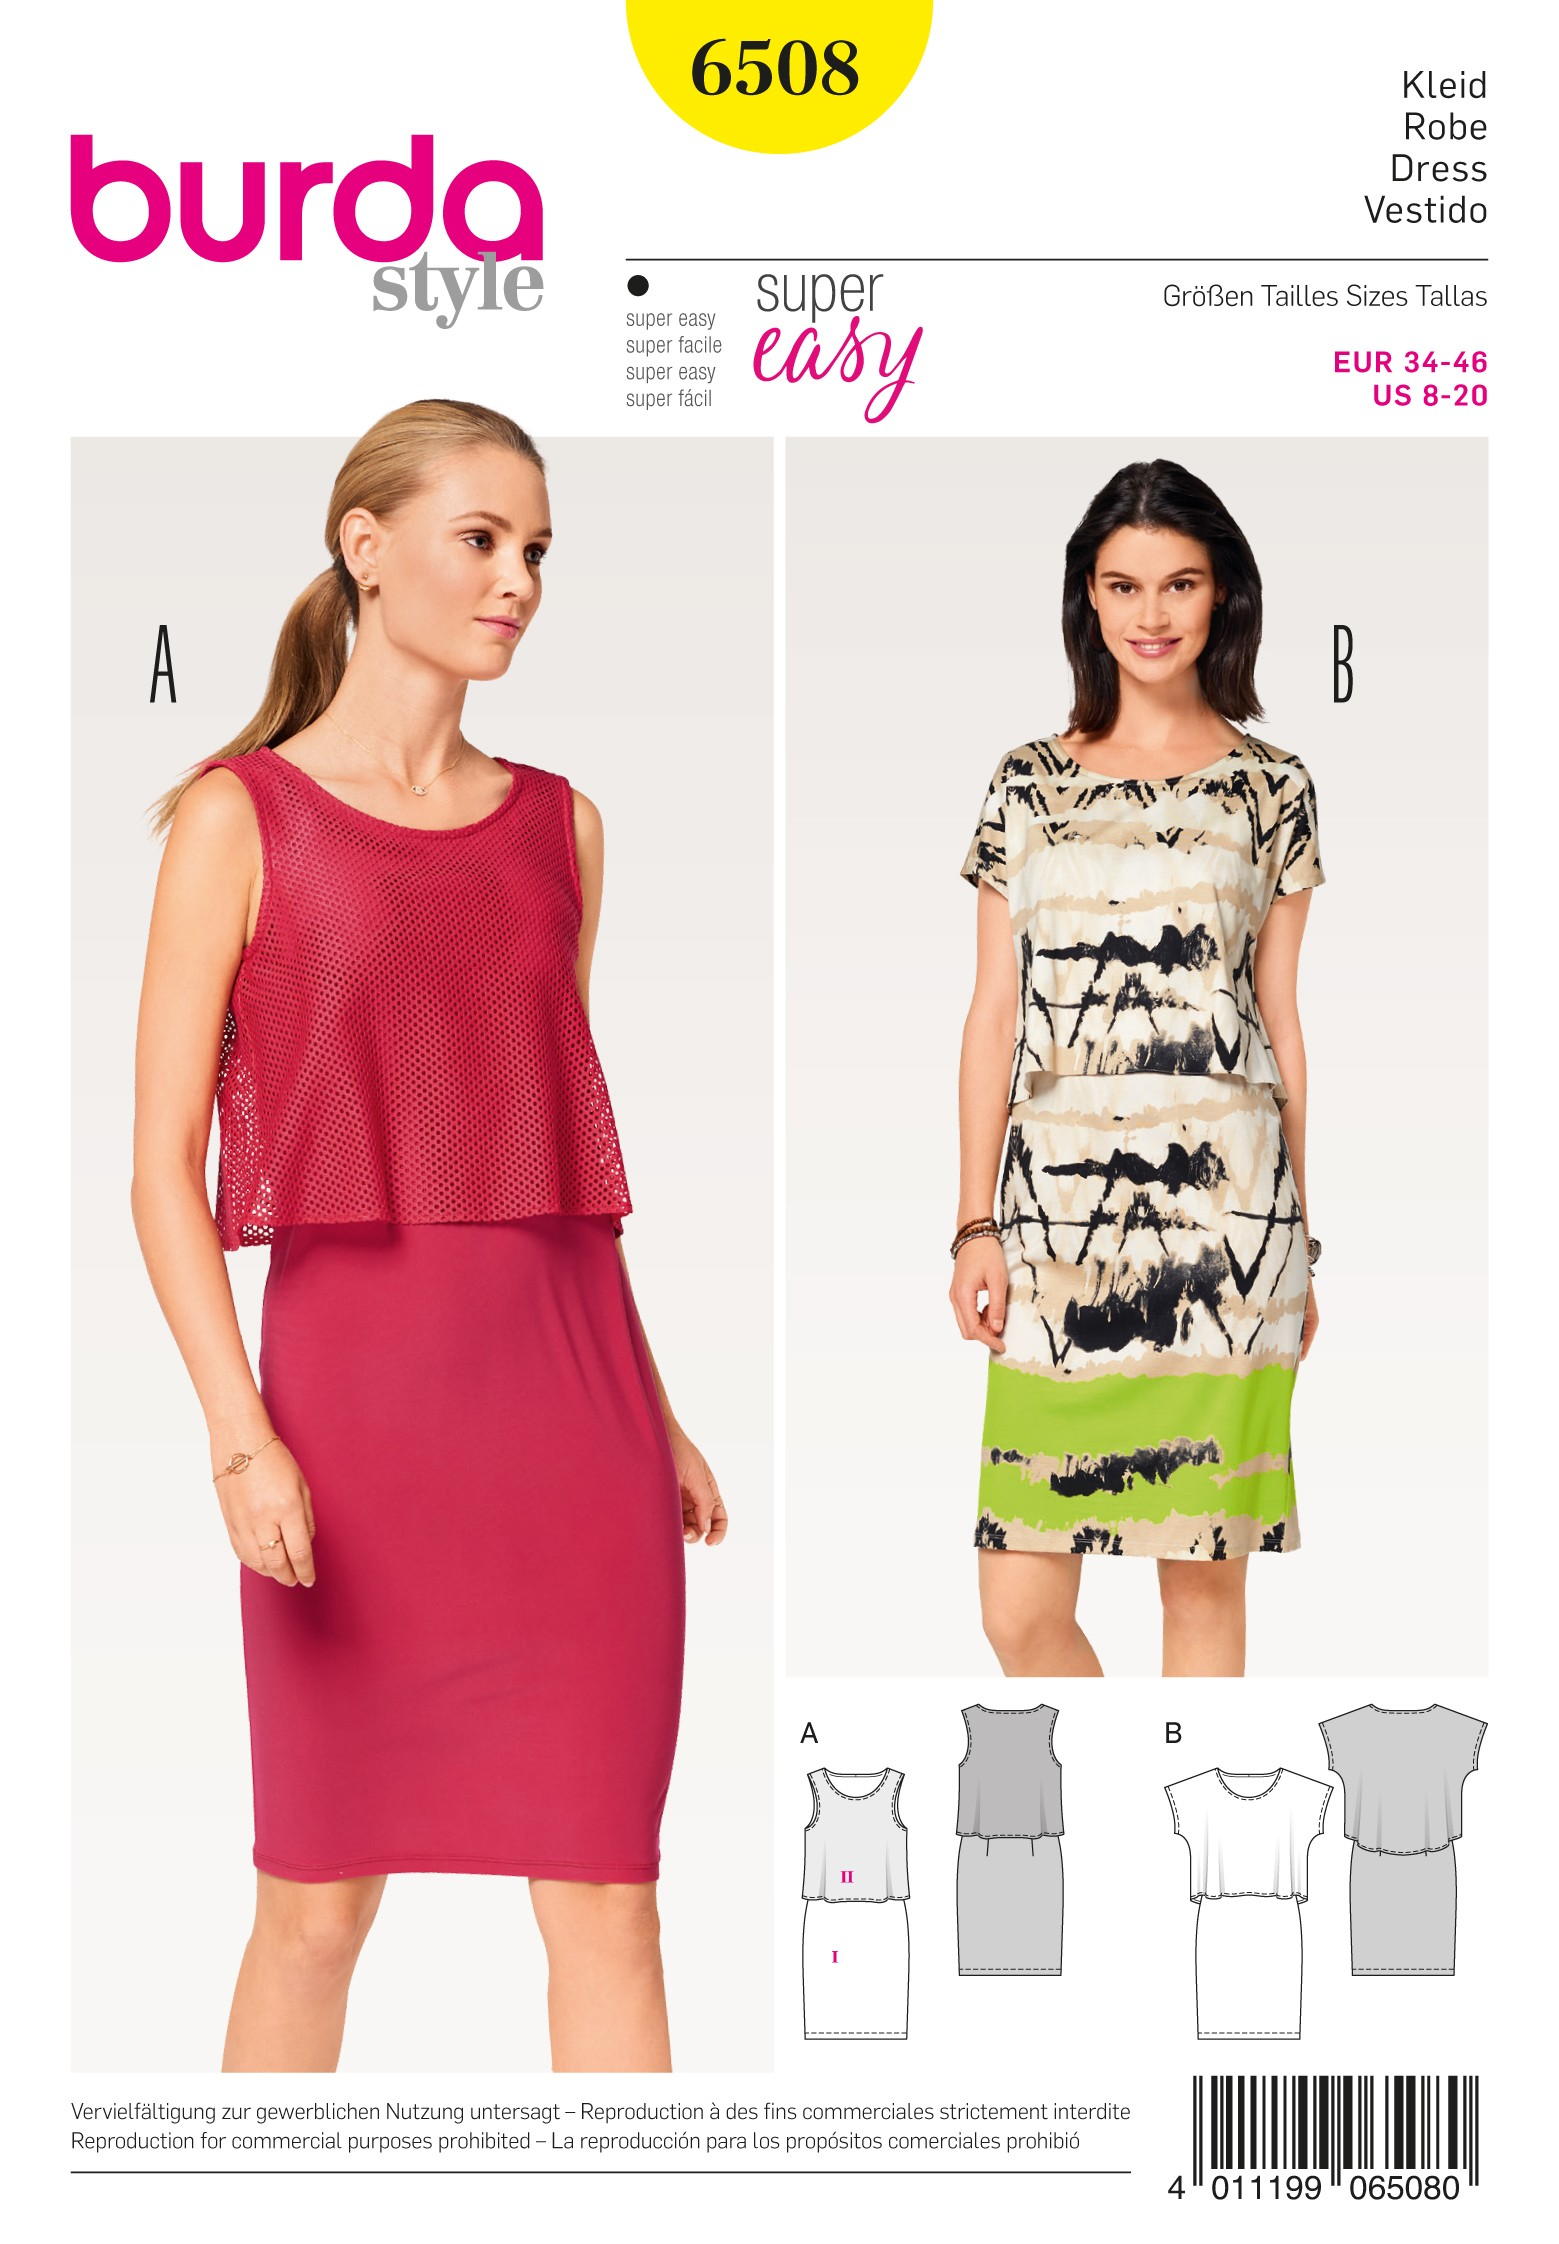 Burda Sewing Pattern 6508 Style Misses' Dress Tops